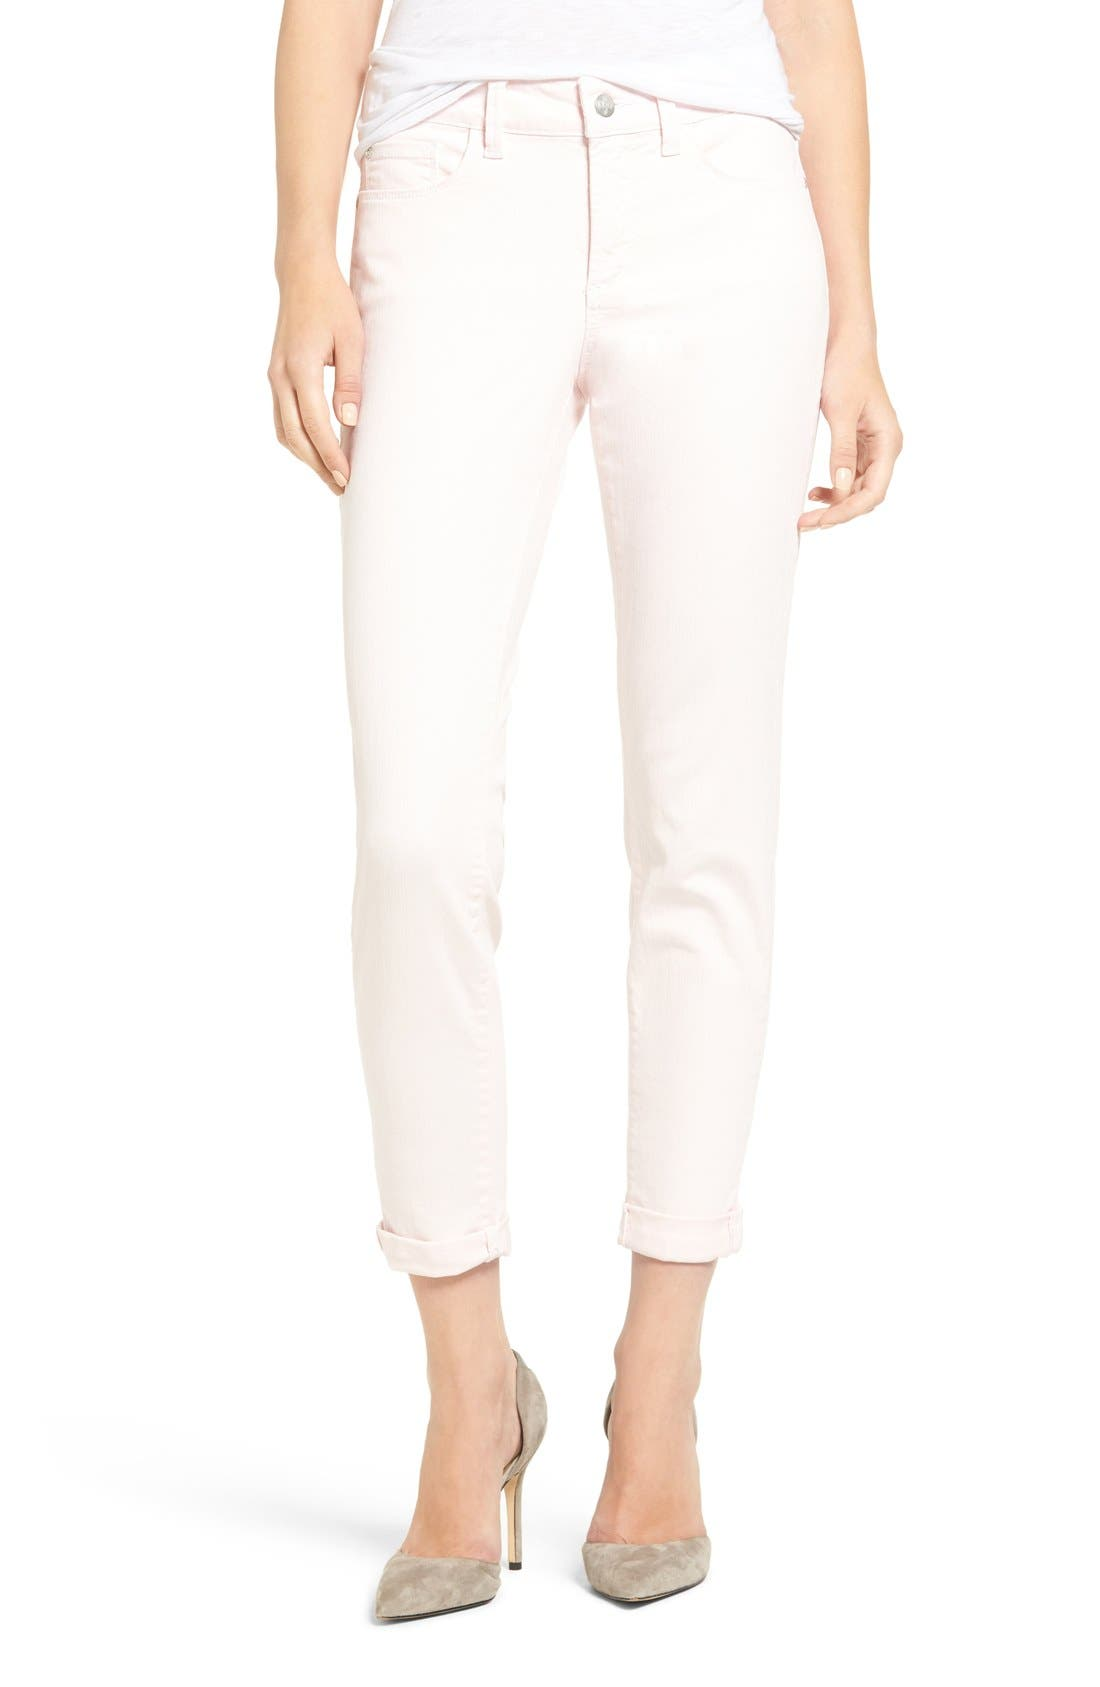 Alternate Image 1 Selected - NYDJ Alina Convertible Ankle Jeans (Regular & Petite)